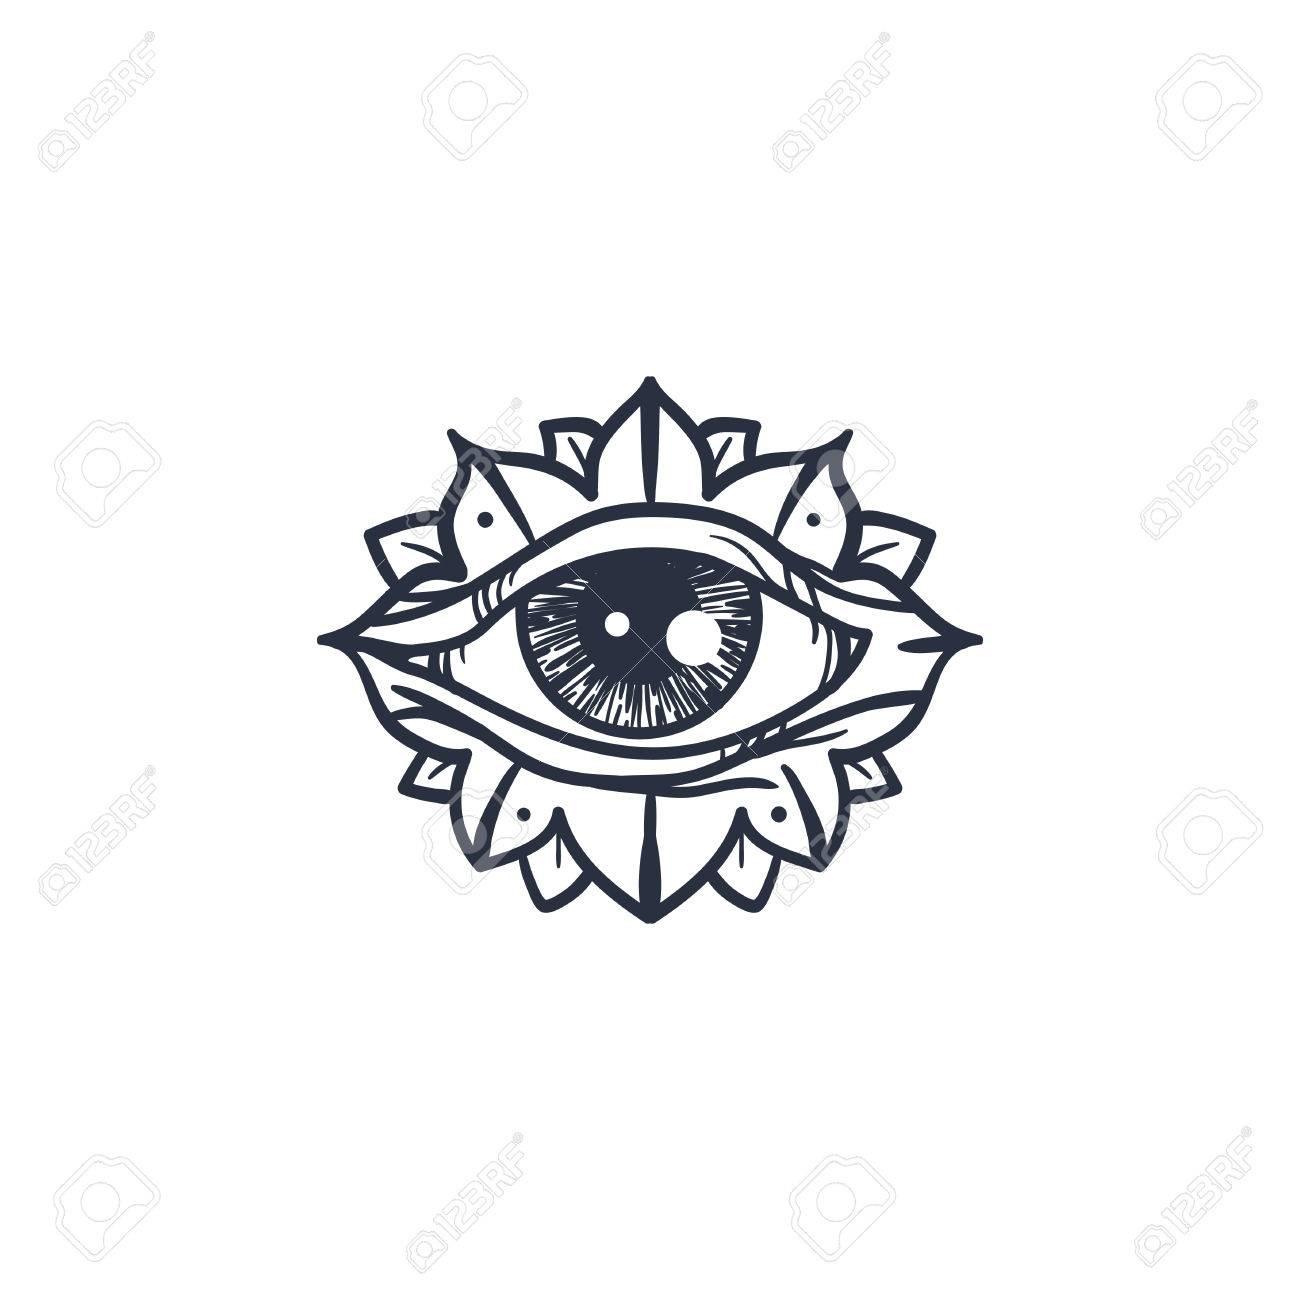 Vintage All Seeing Eye In Mandala Providence Magic Symbol For